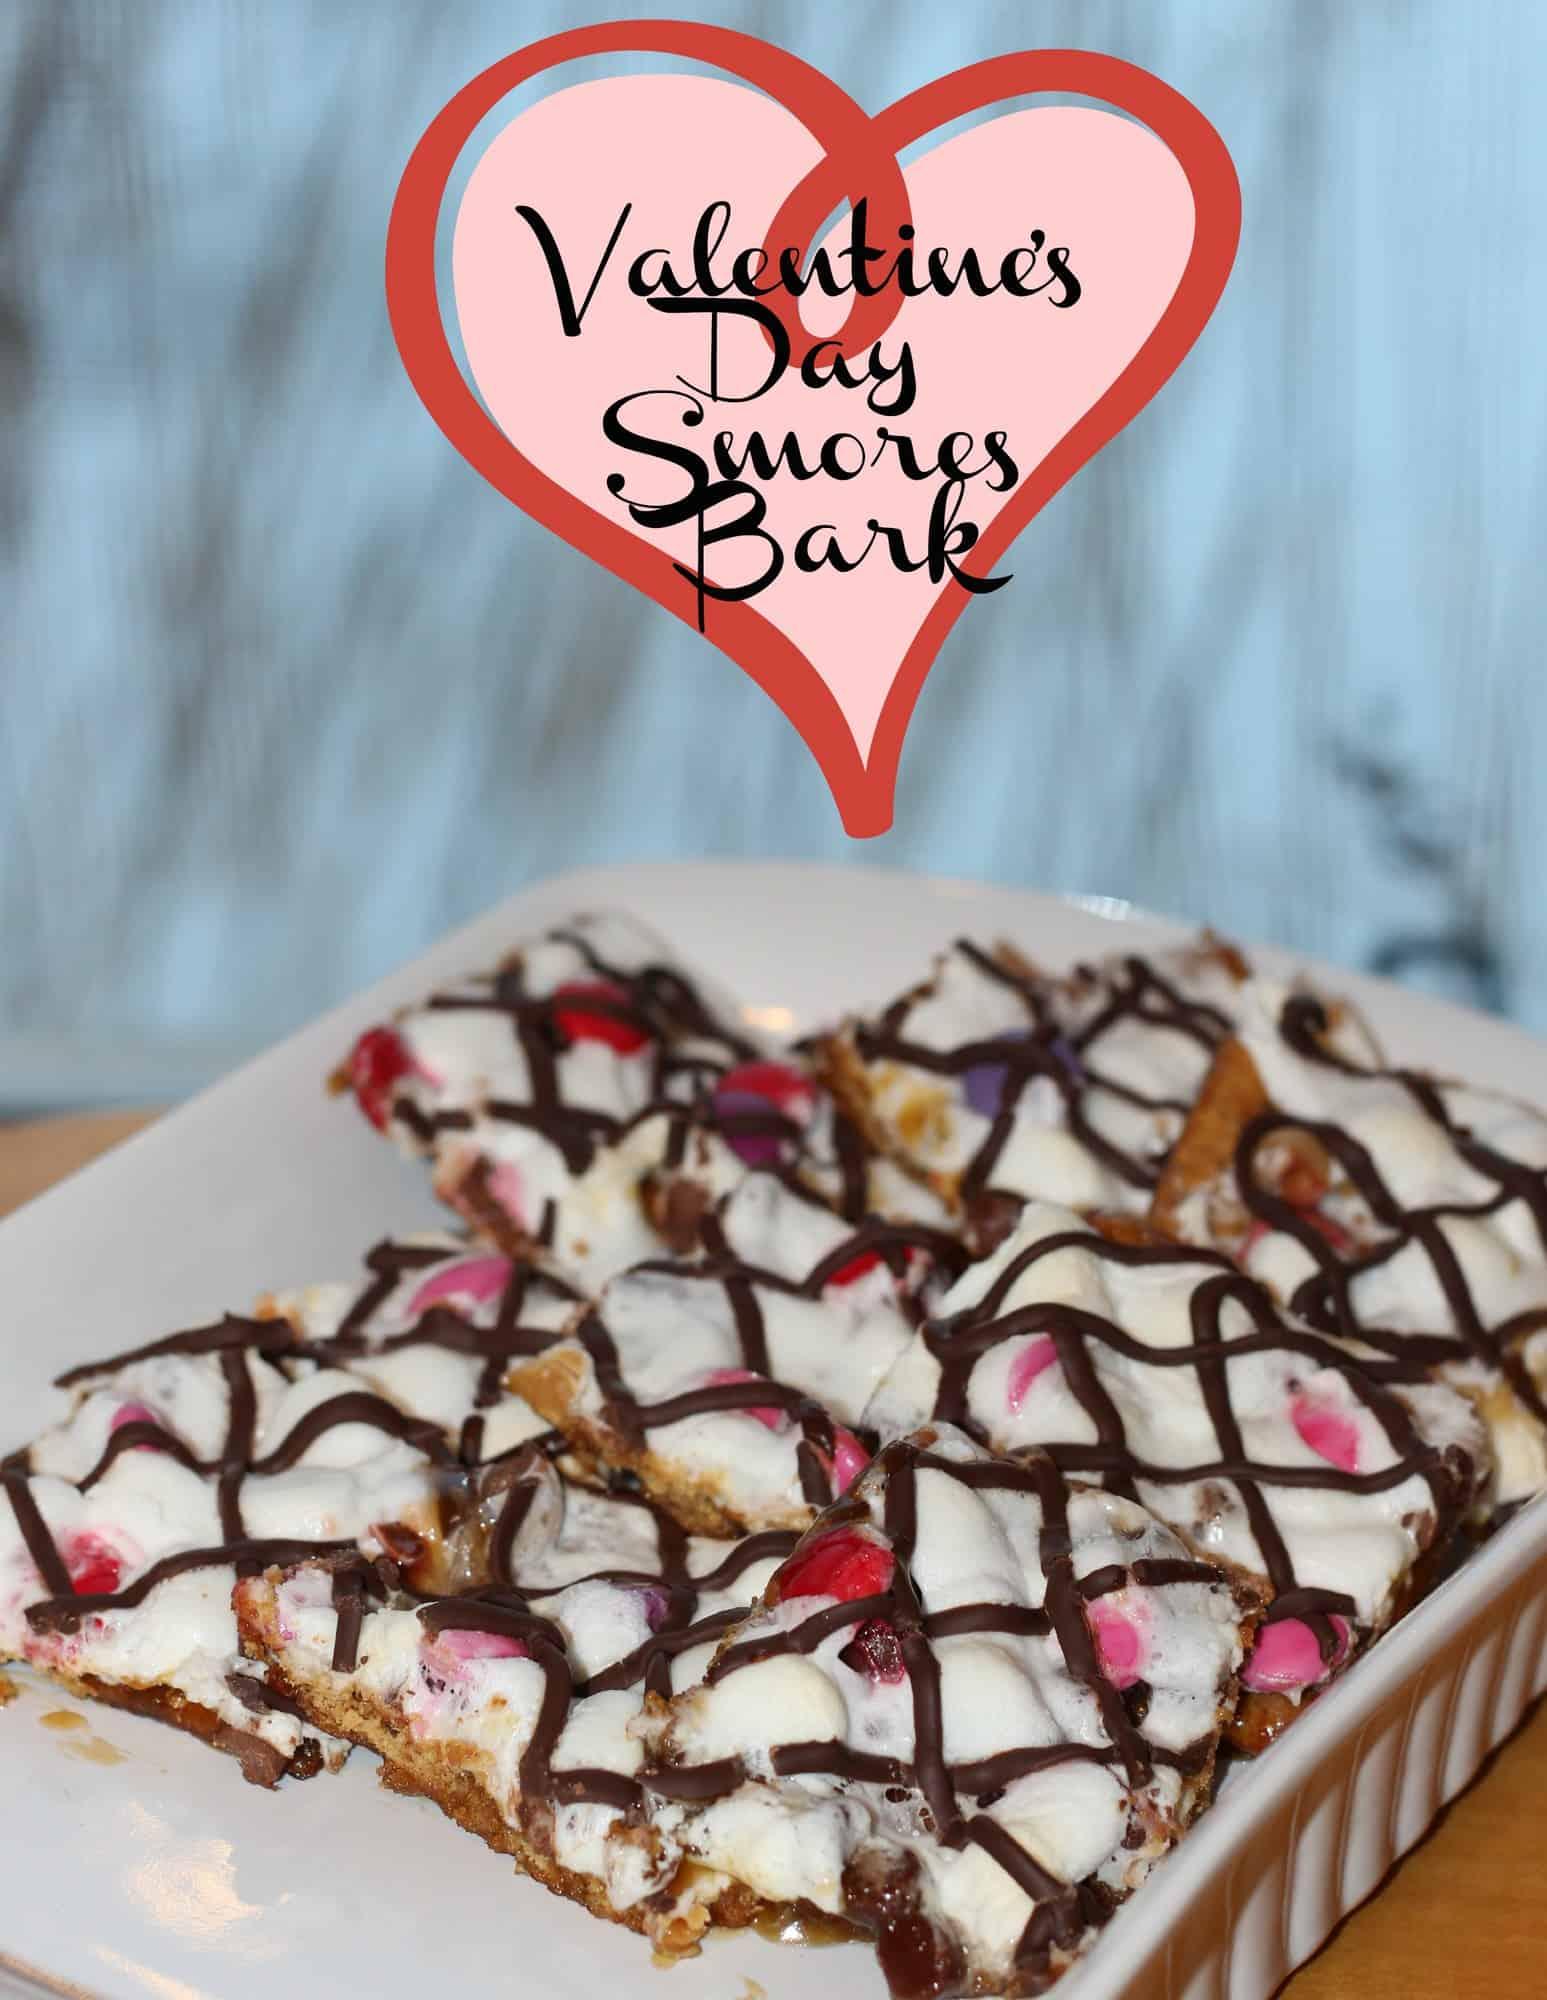 Valentine's Day Smores Bark {Recipe}